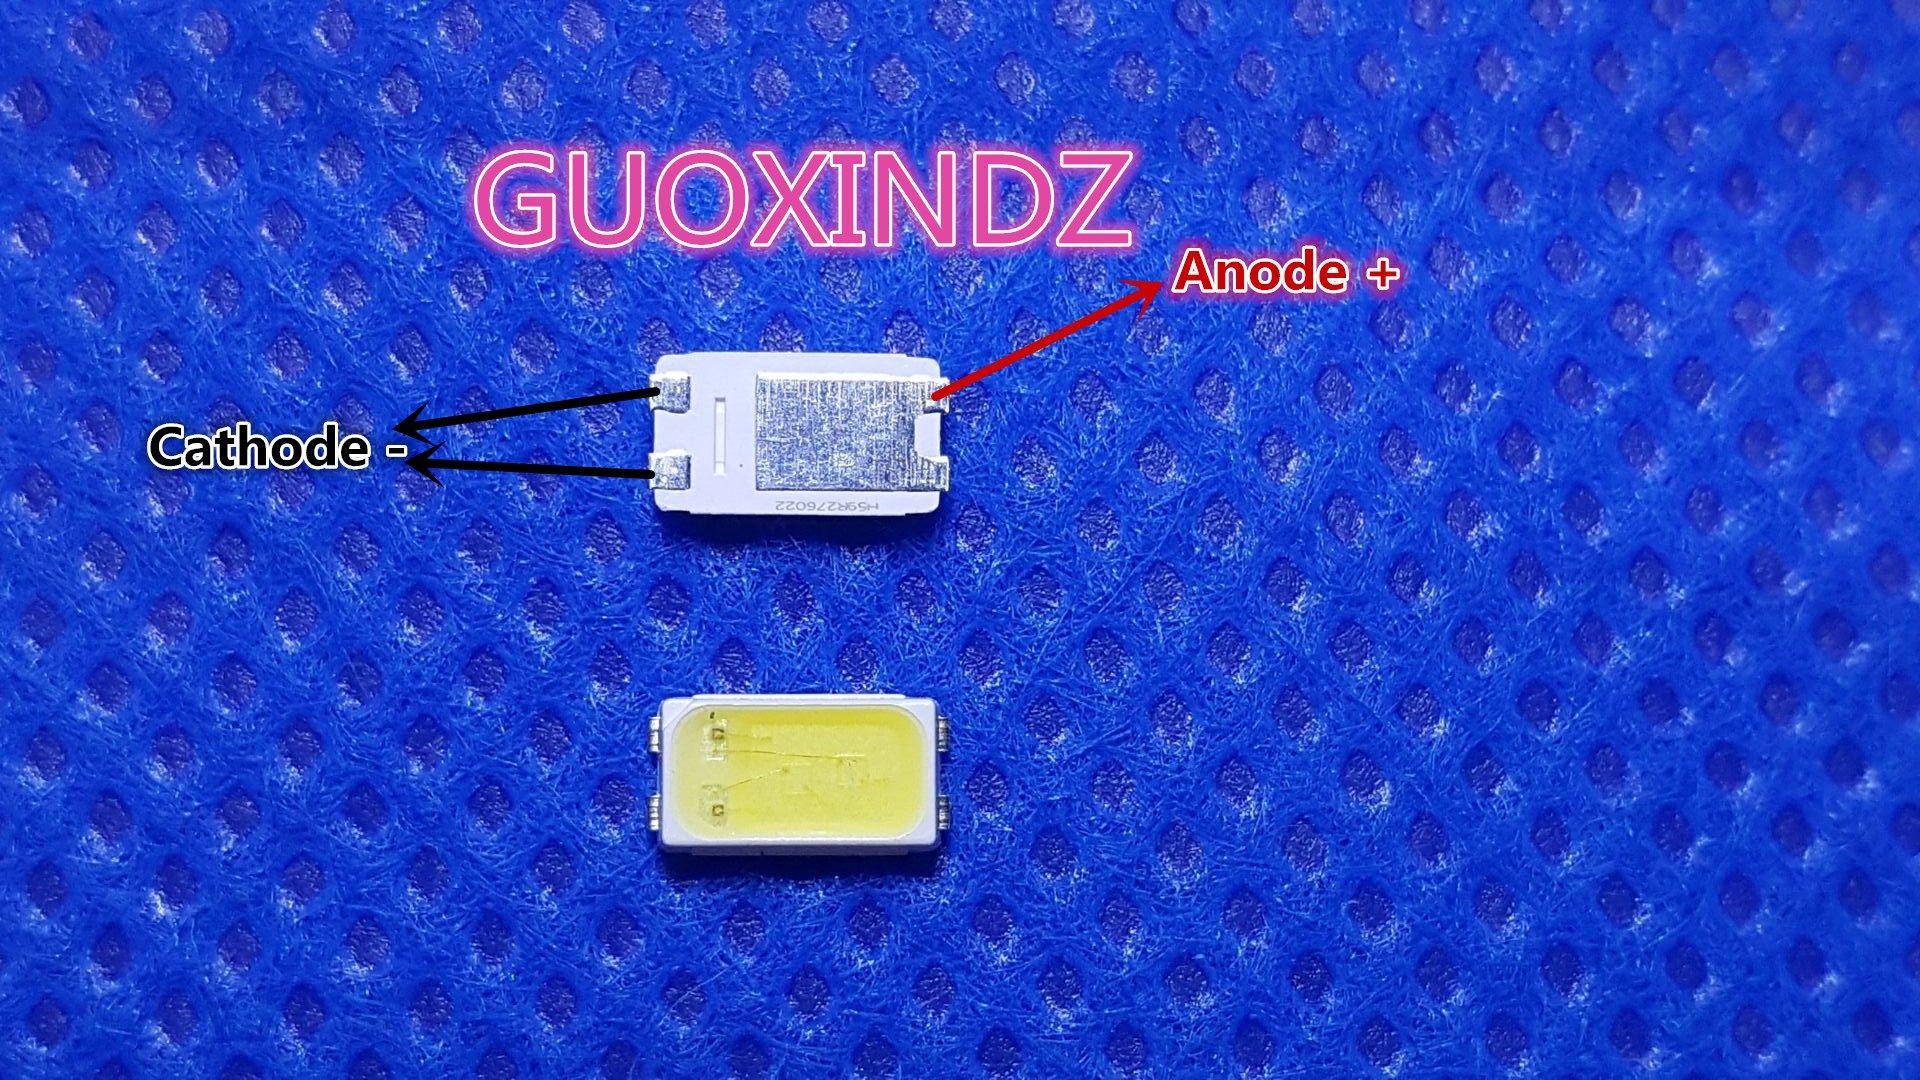 2018 Lg Innotek Led Backlight Middle Power 05w 3v 5630 Cool Circuit White Lcd For Tv Application From Guoxindz 553